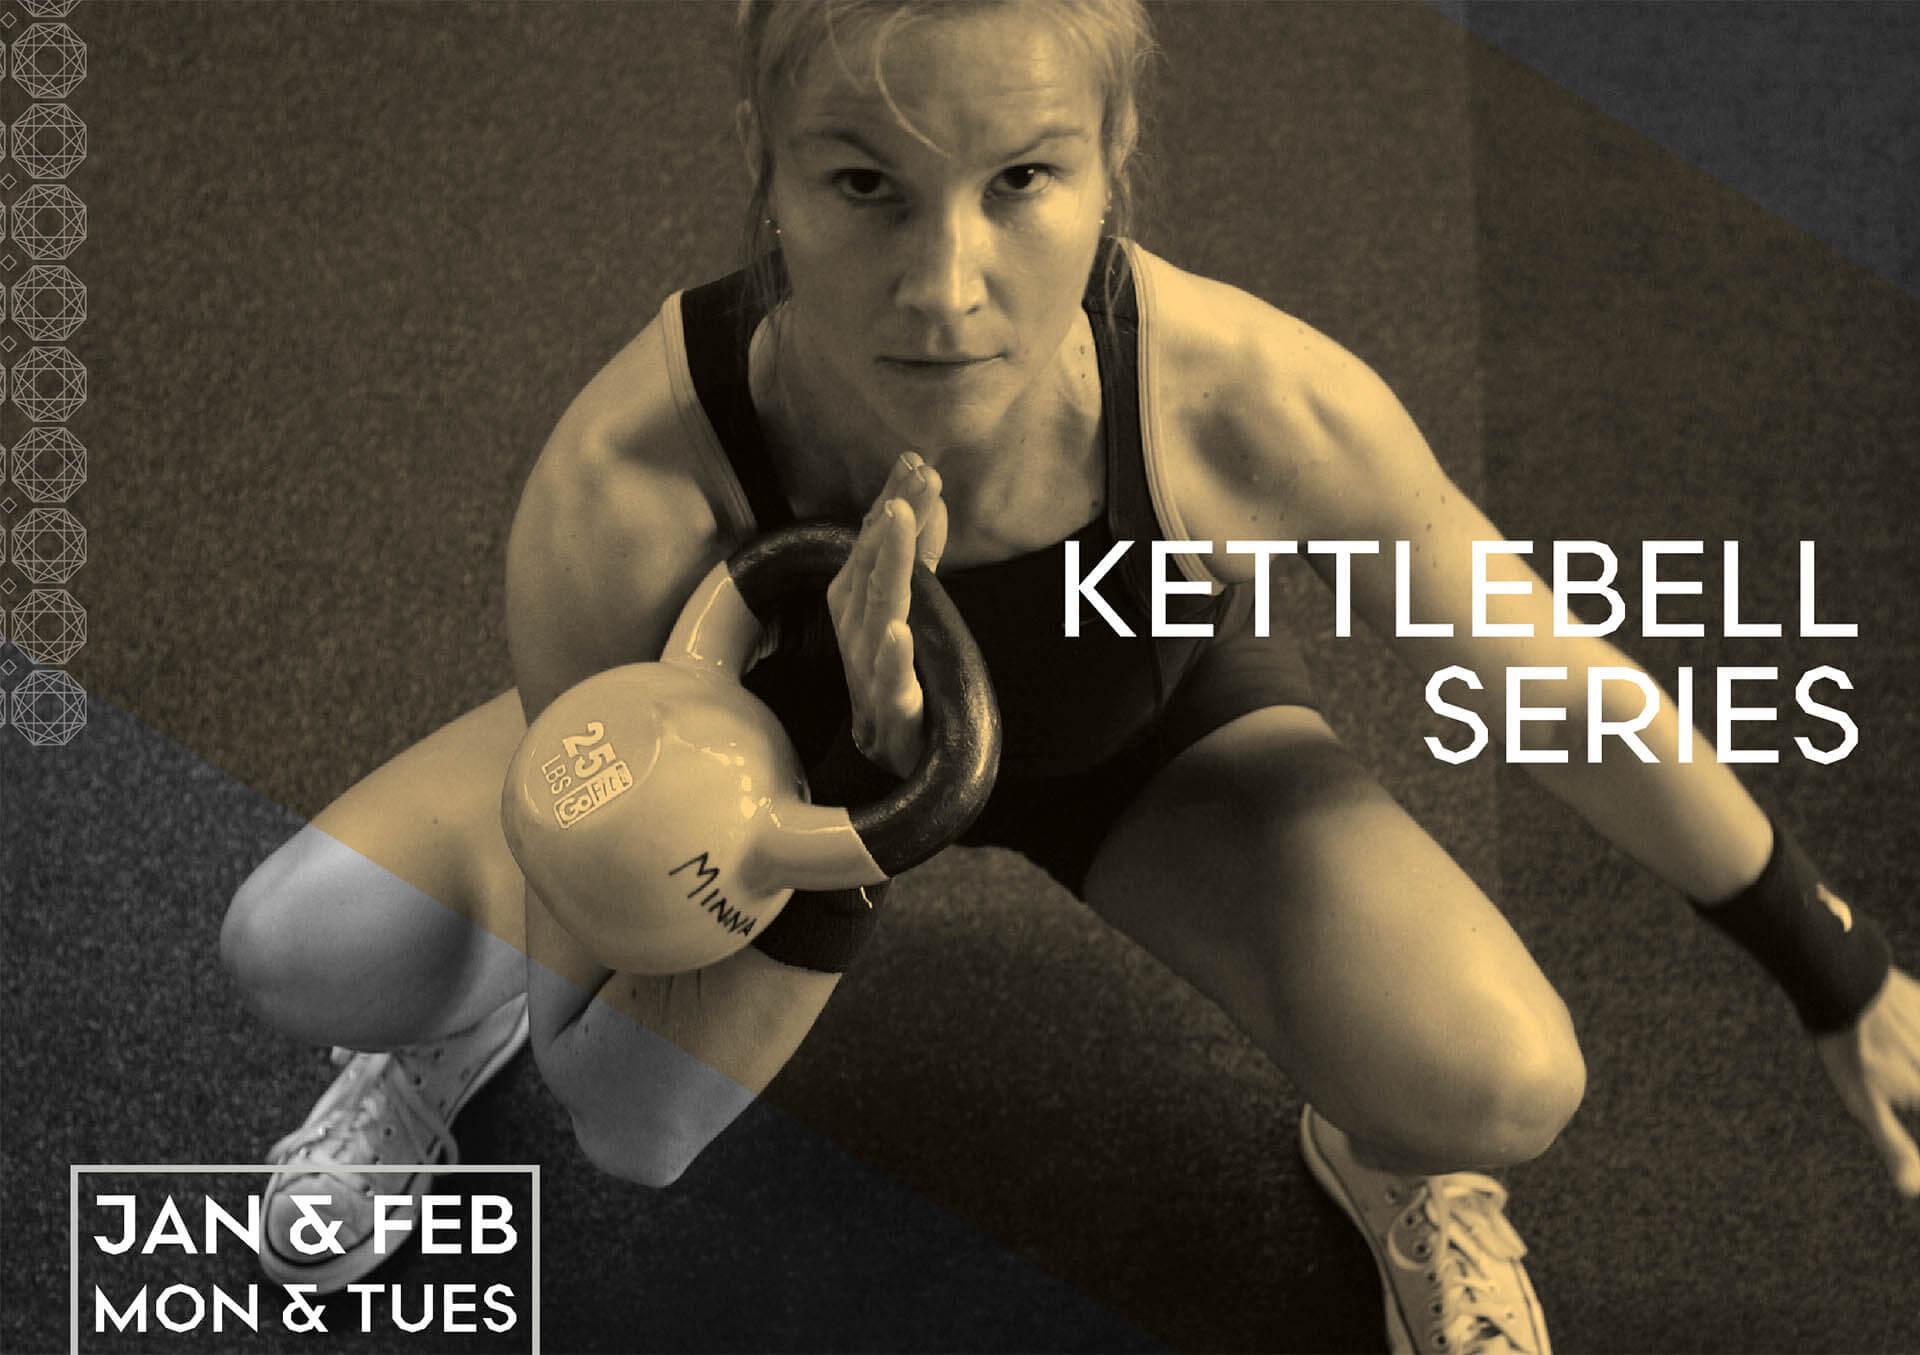 Kettlebell Workouts: Full Body Strength